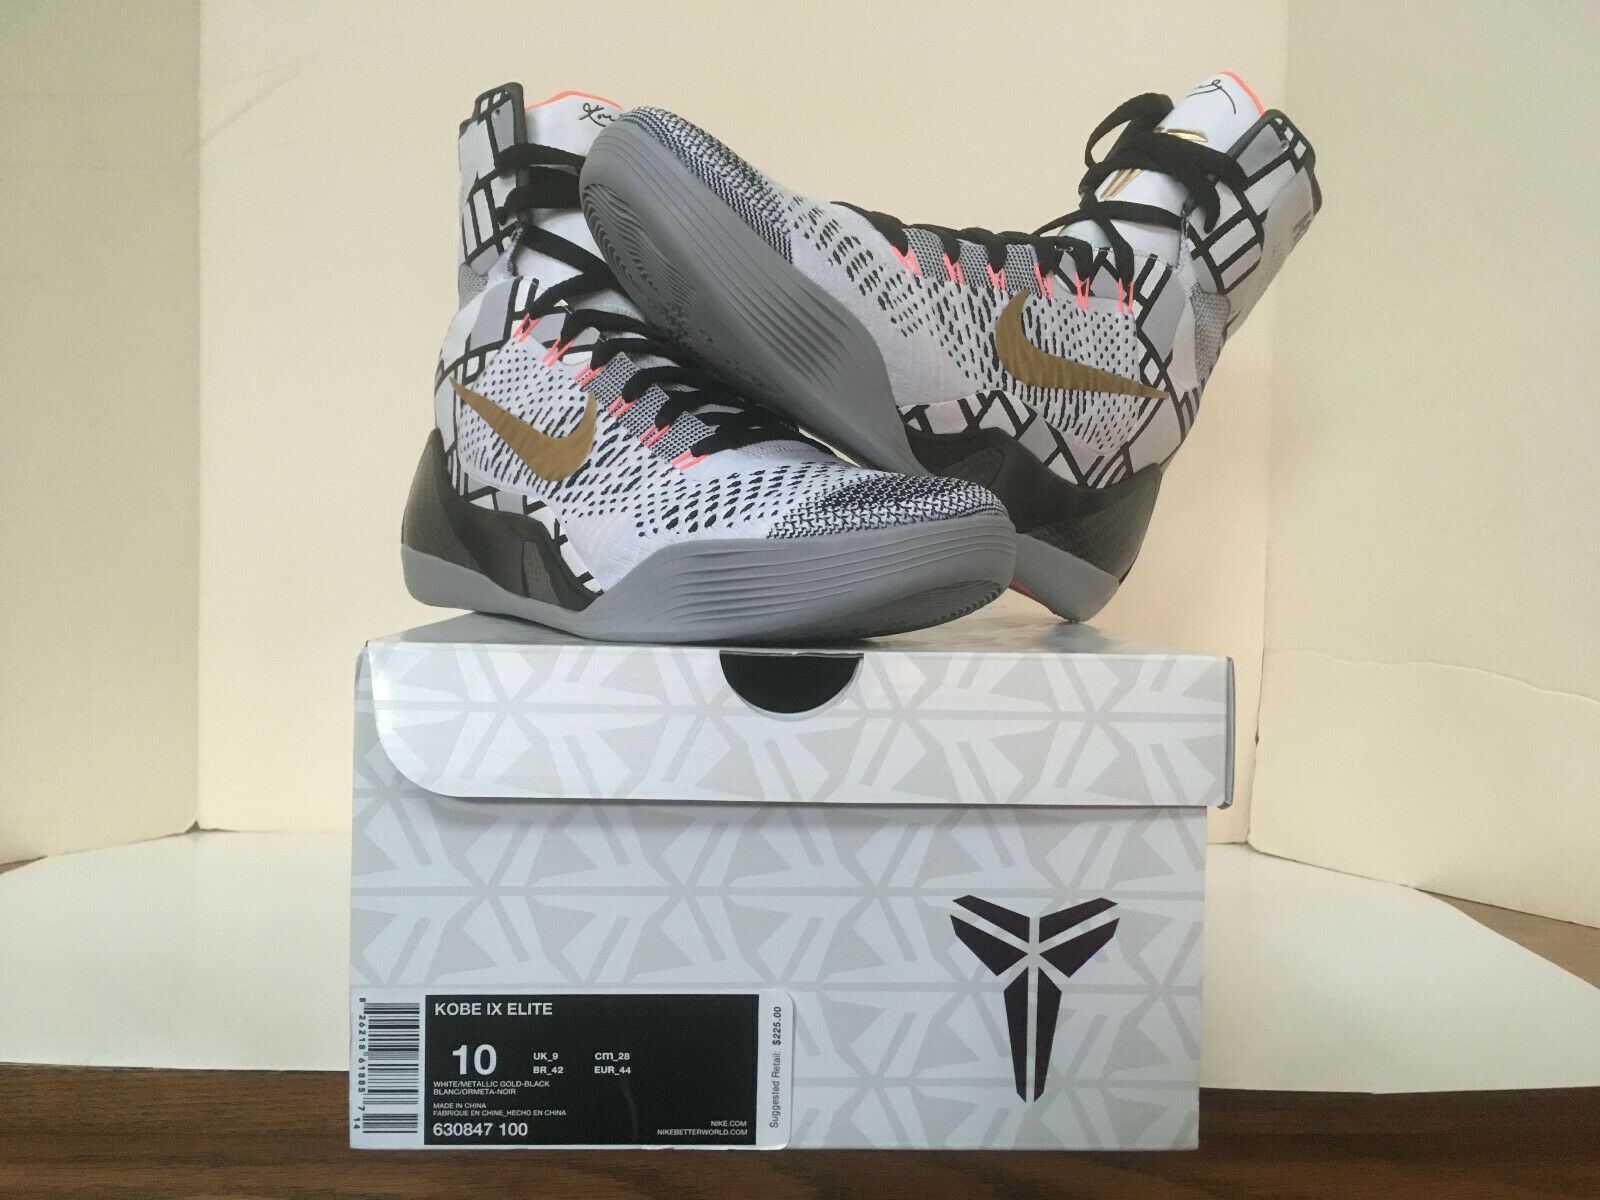 Nike Kobe IX 9 Elite gold Fundamentals size 10 deadstock w receipt